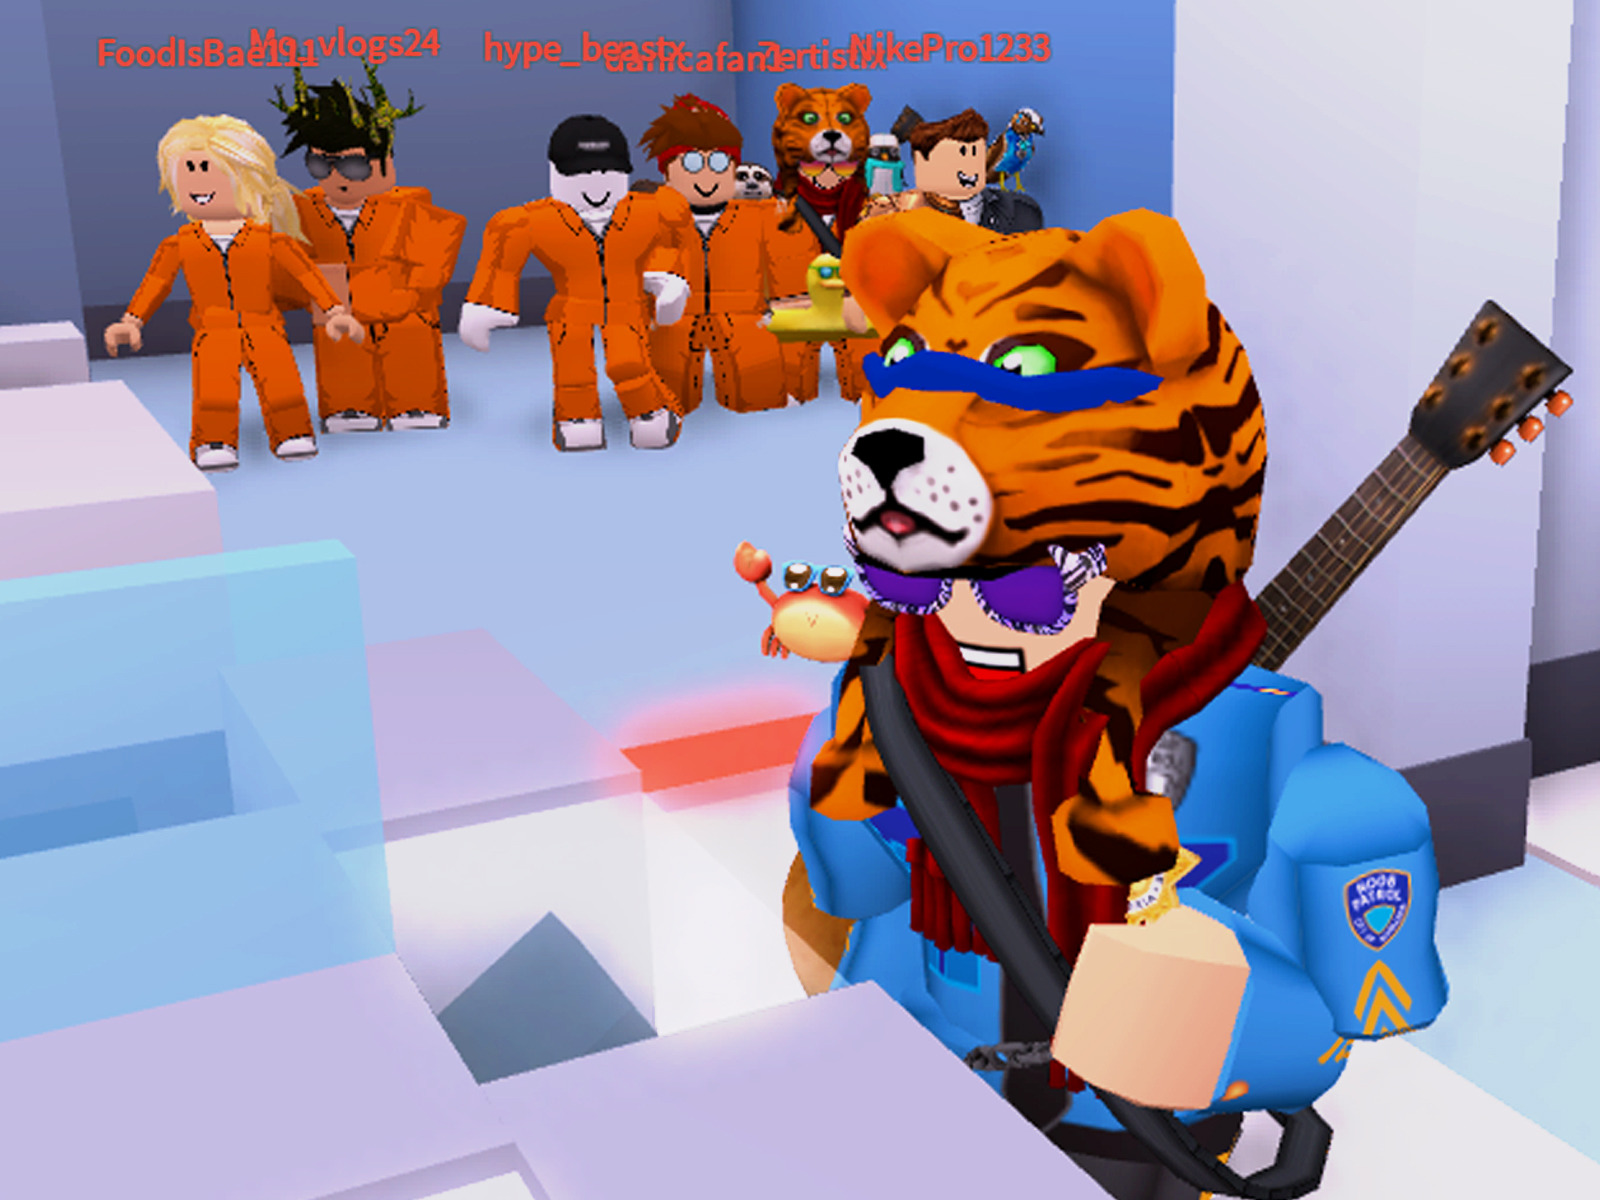 Amazoncom Watch Clip Roblox Jailbreak Funny Moments Prime Video Clip Roblox Jailbreak Funny Moments Roblox Adventures